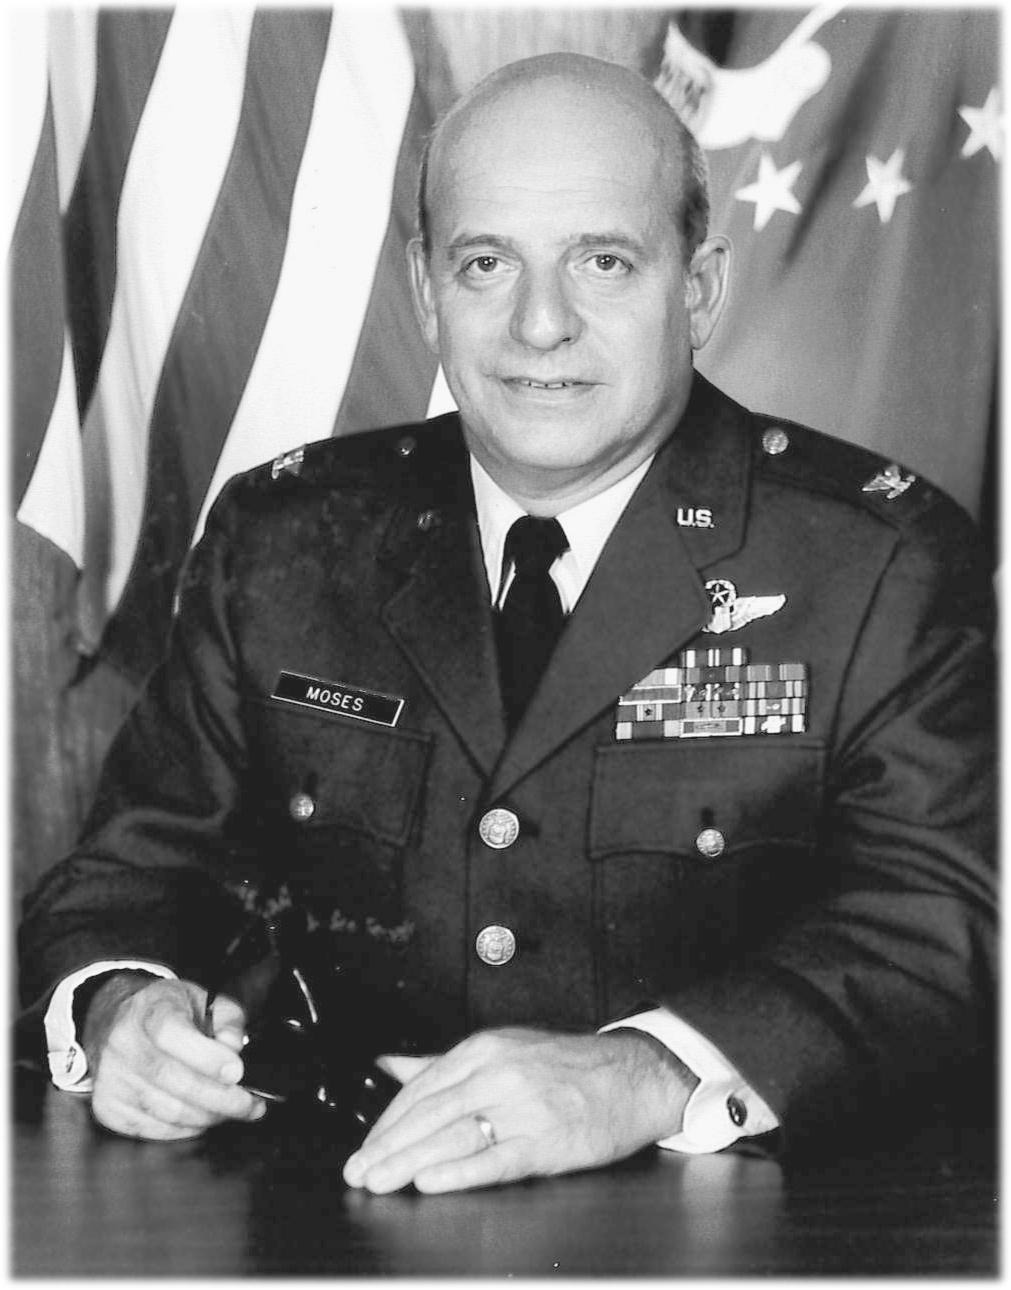 Moses Jr., William F. Col. USAF (Ret)